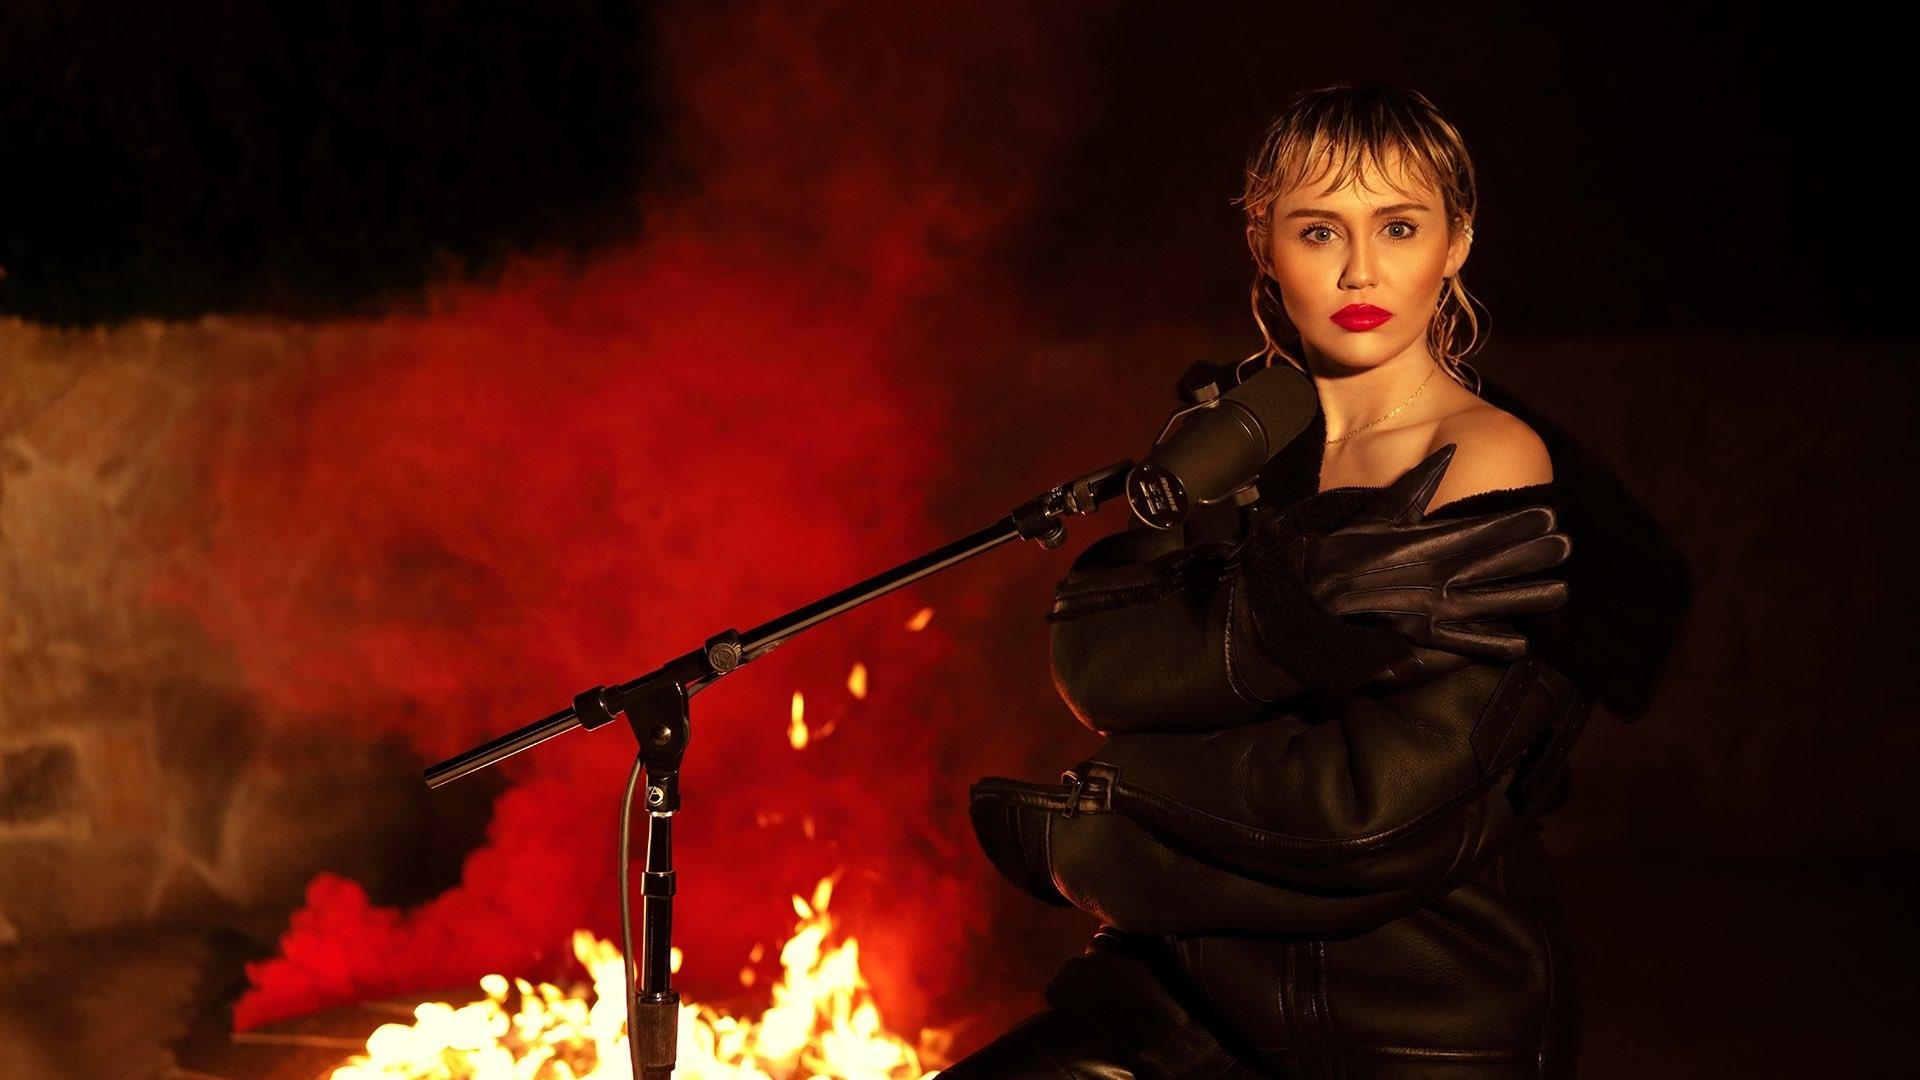 Miley Cyrus | Miley, Miley cyrus, Hottest celebrities